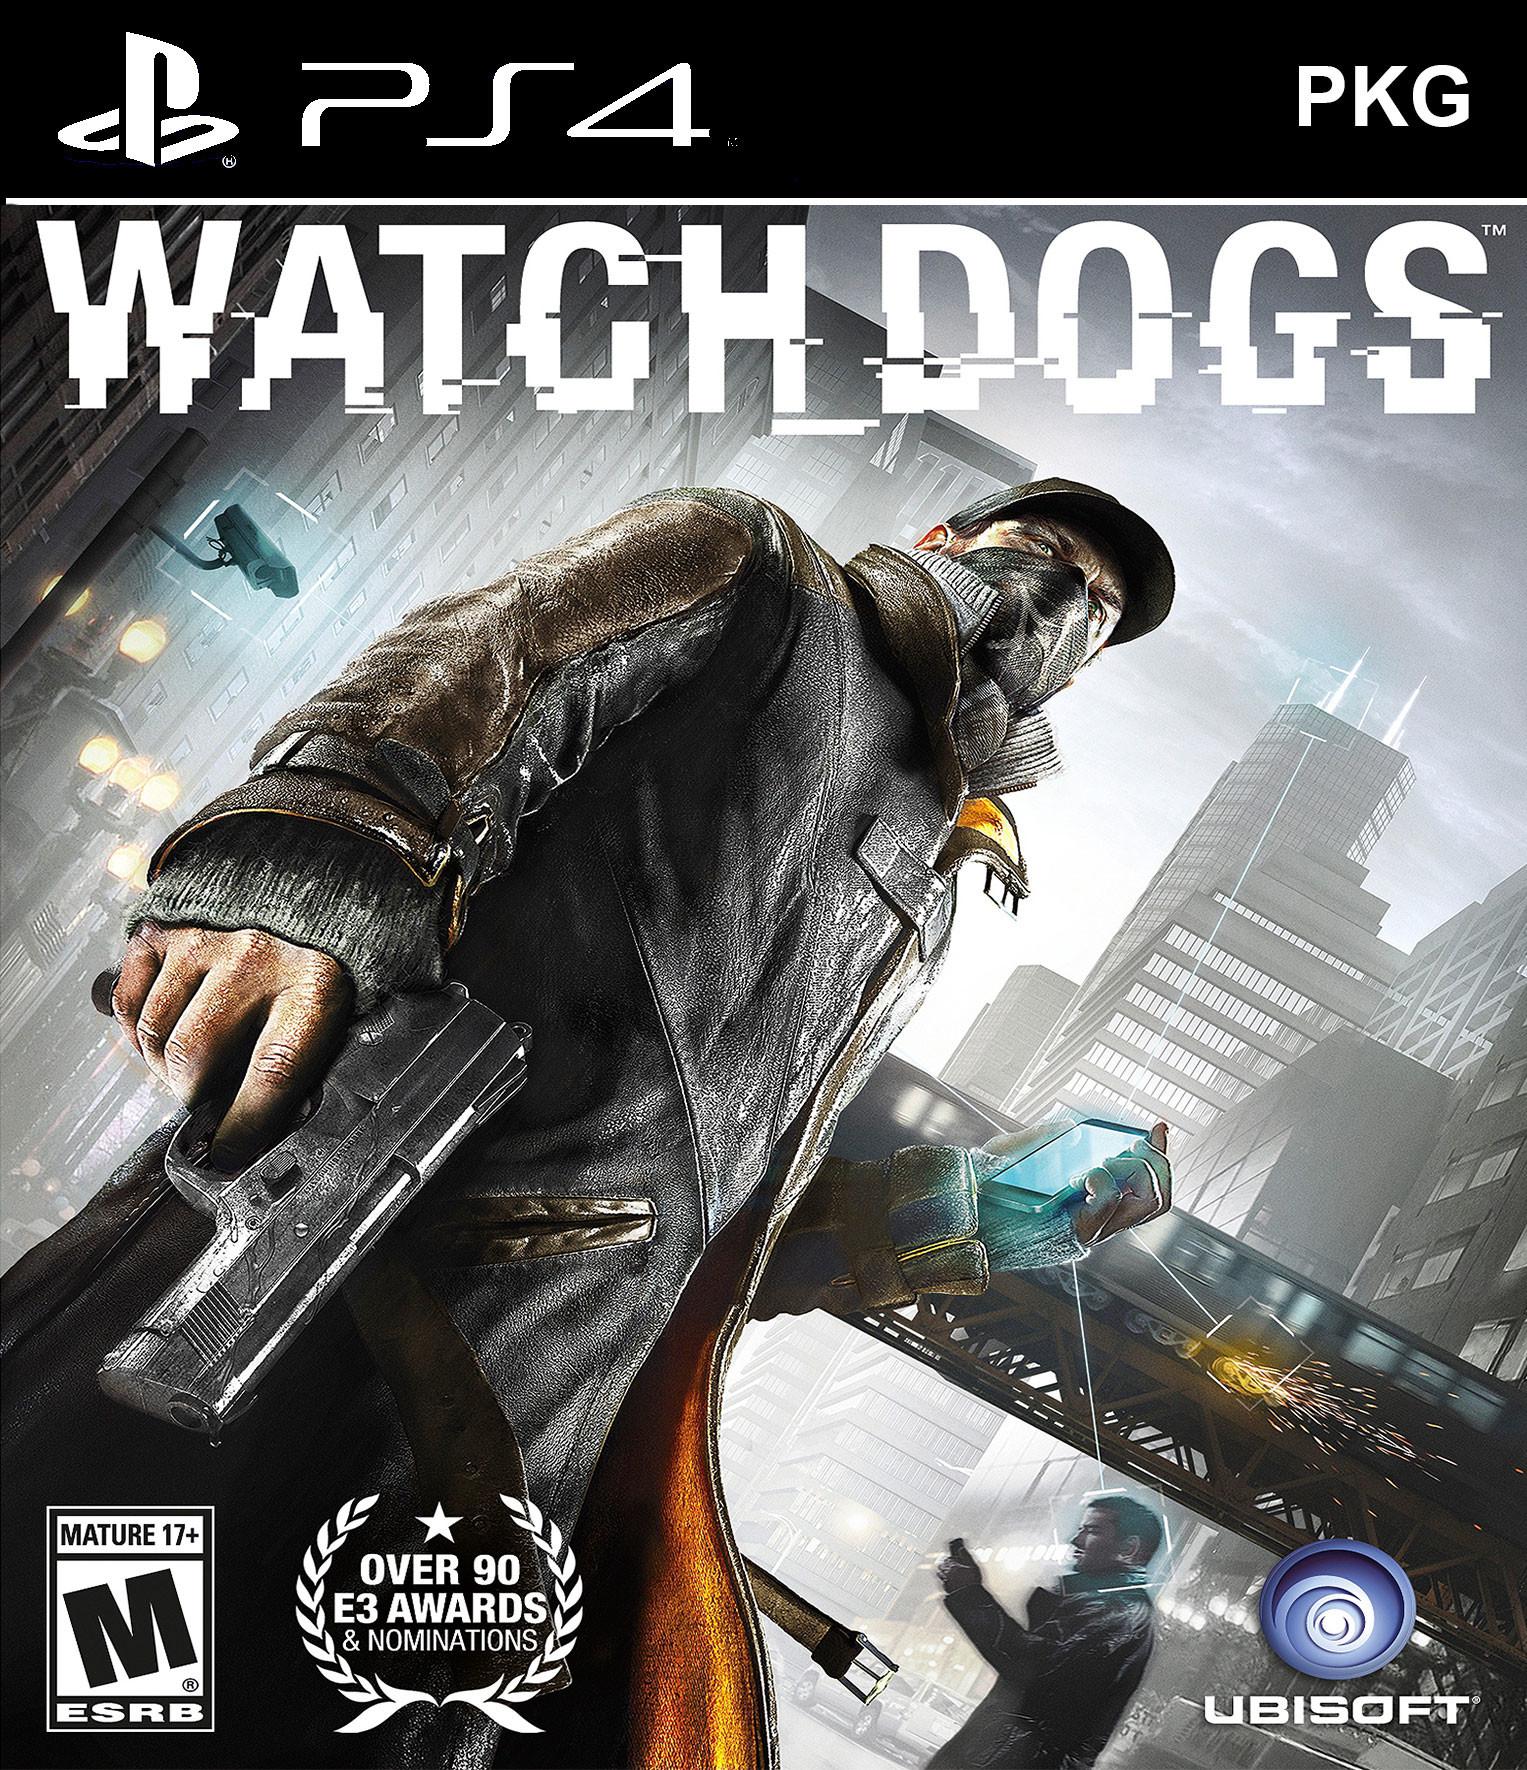 Watch Dogs PKG Oyun İndir ! [4.05